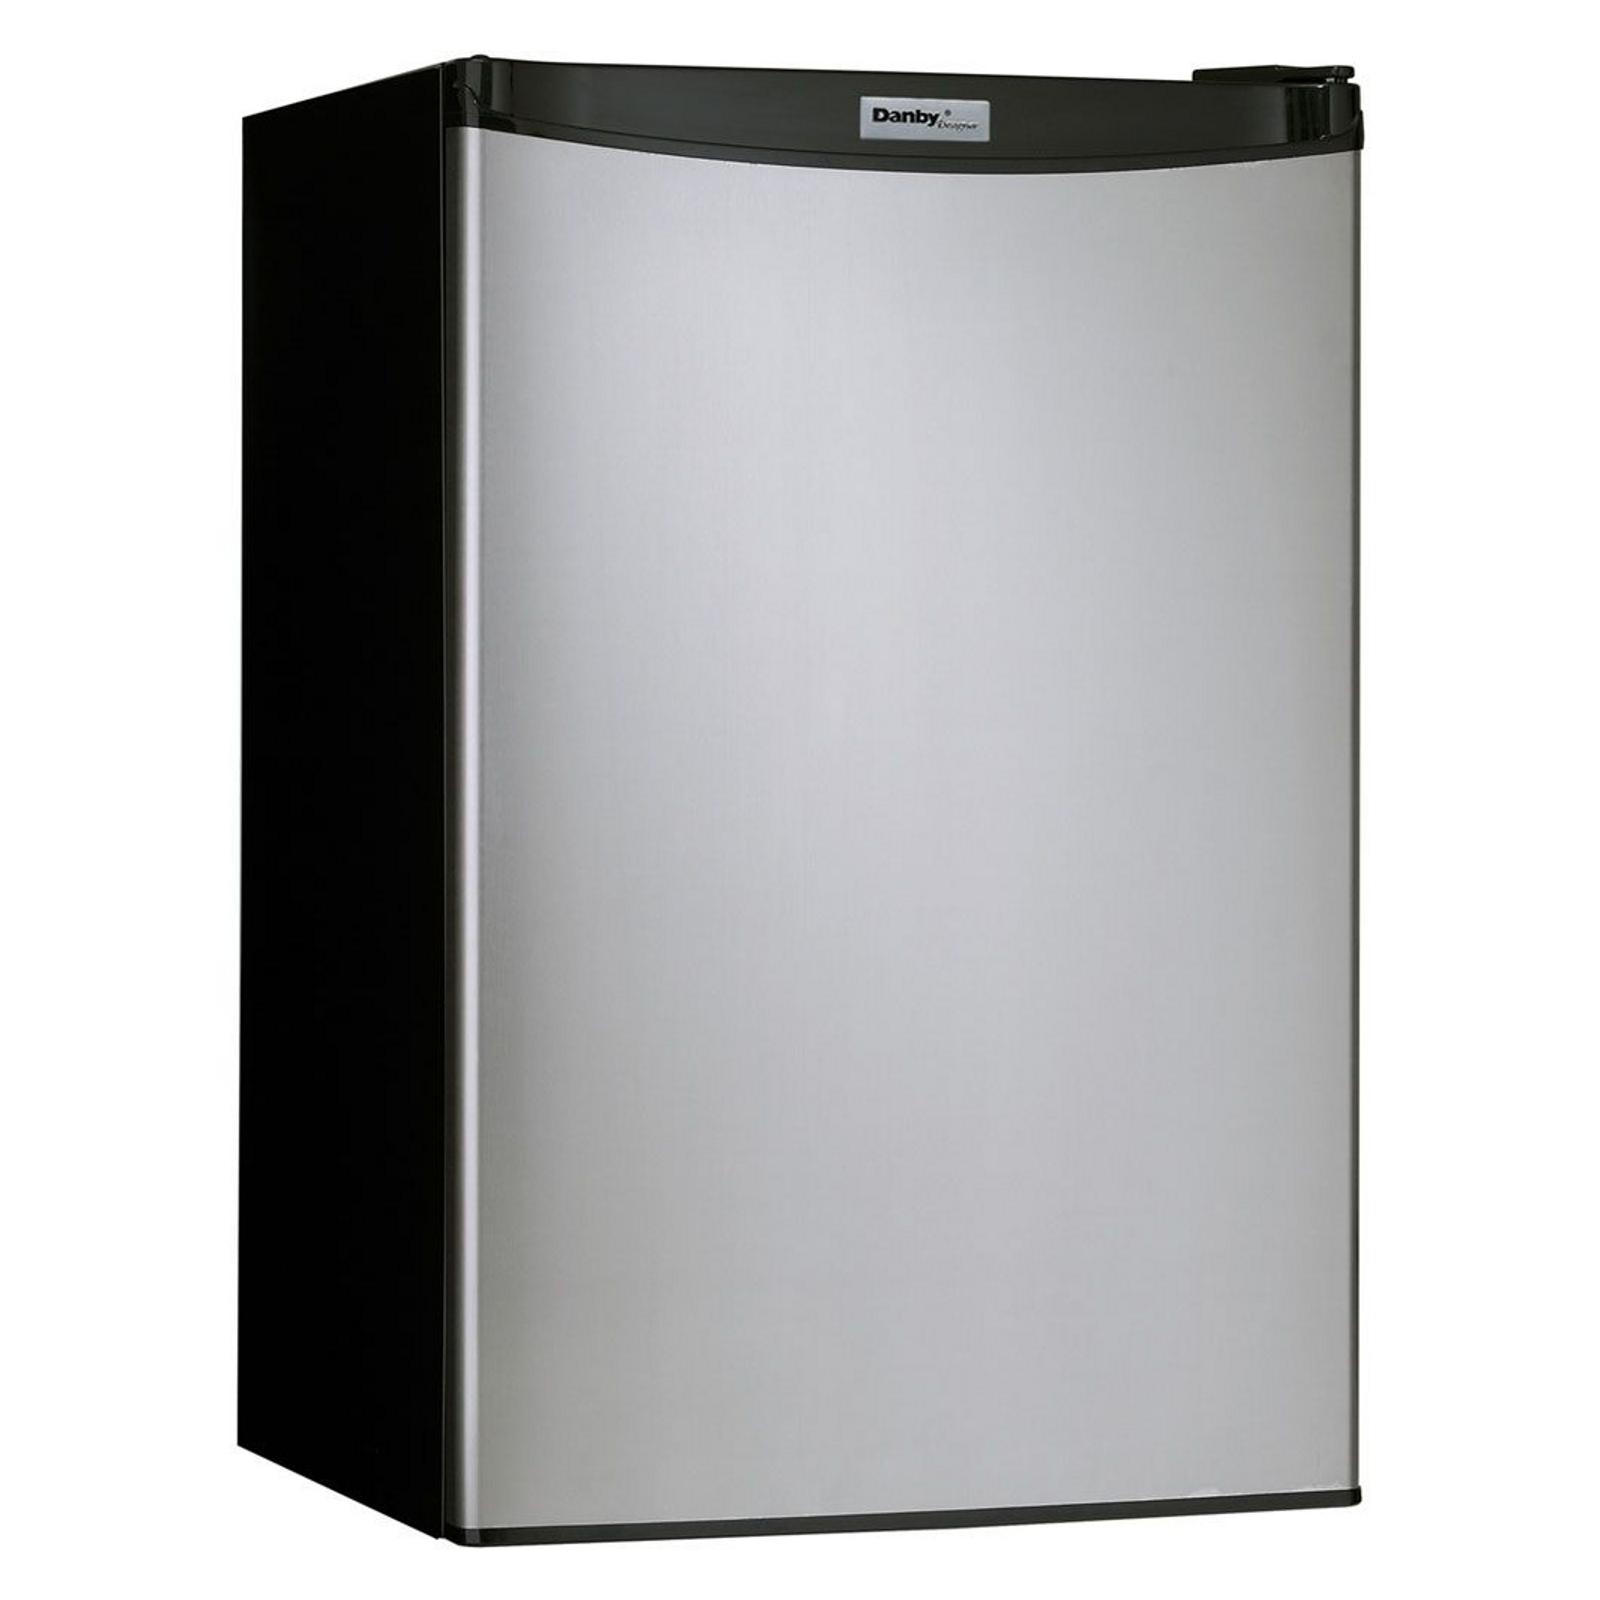 Danby Dar259bl 2.5 Cu. Ft. Designer Compact Refrigerator - Black